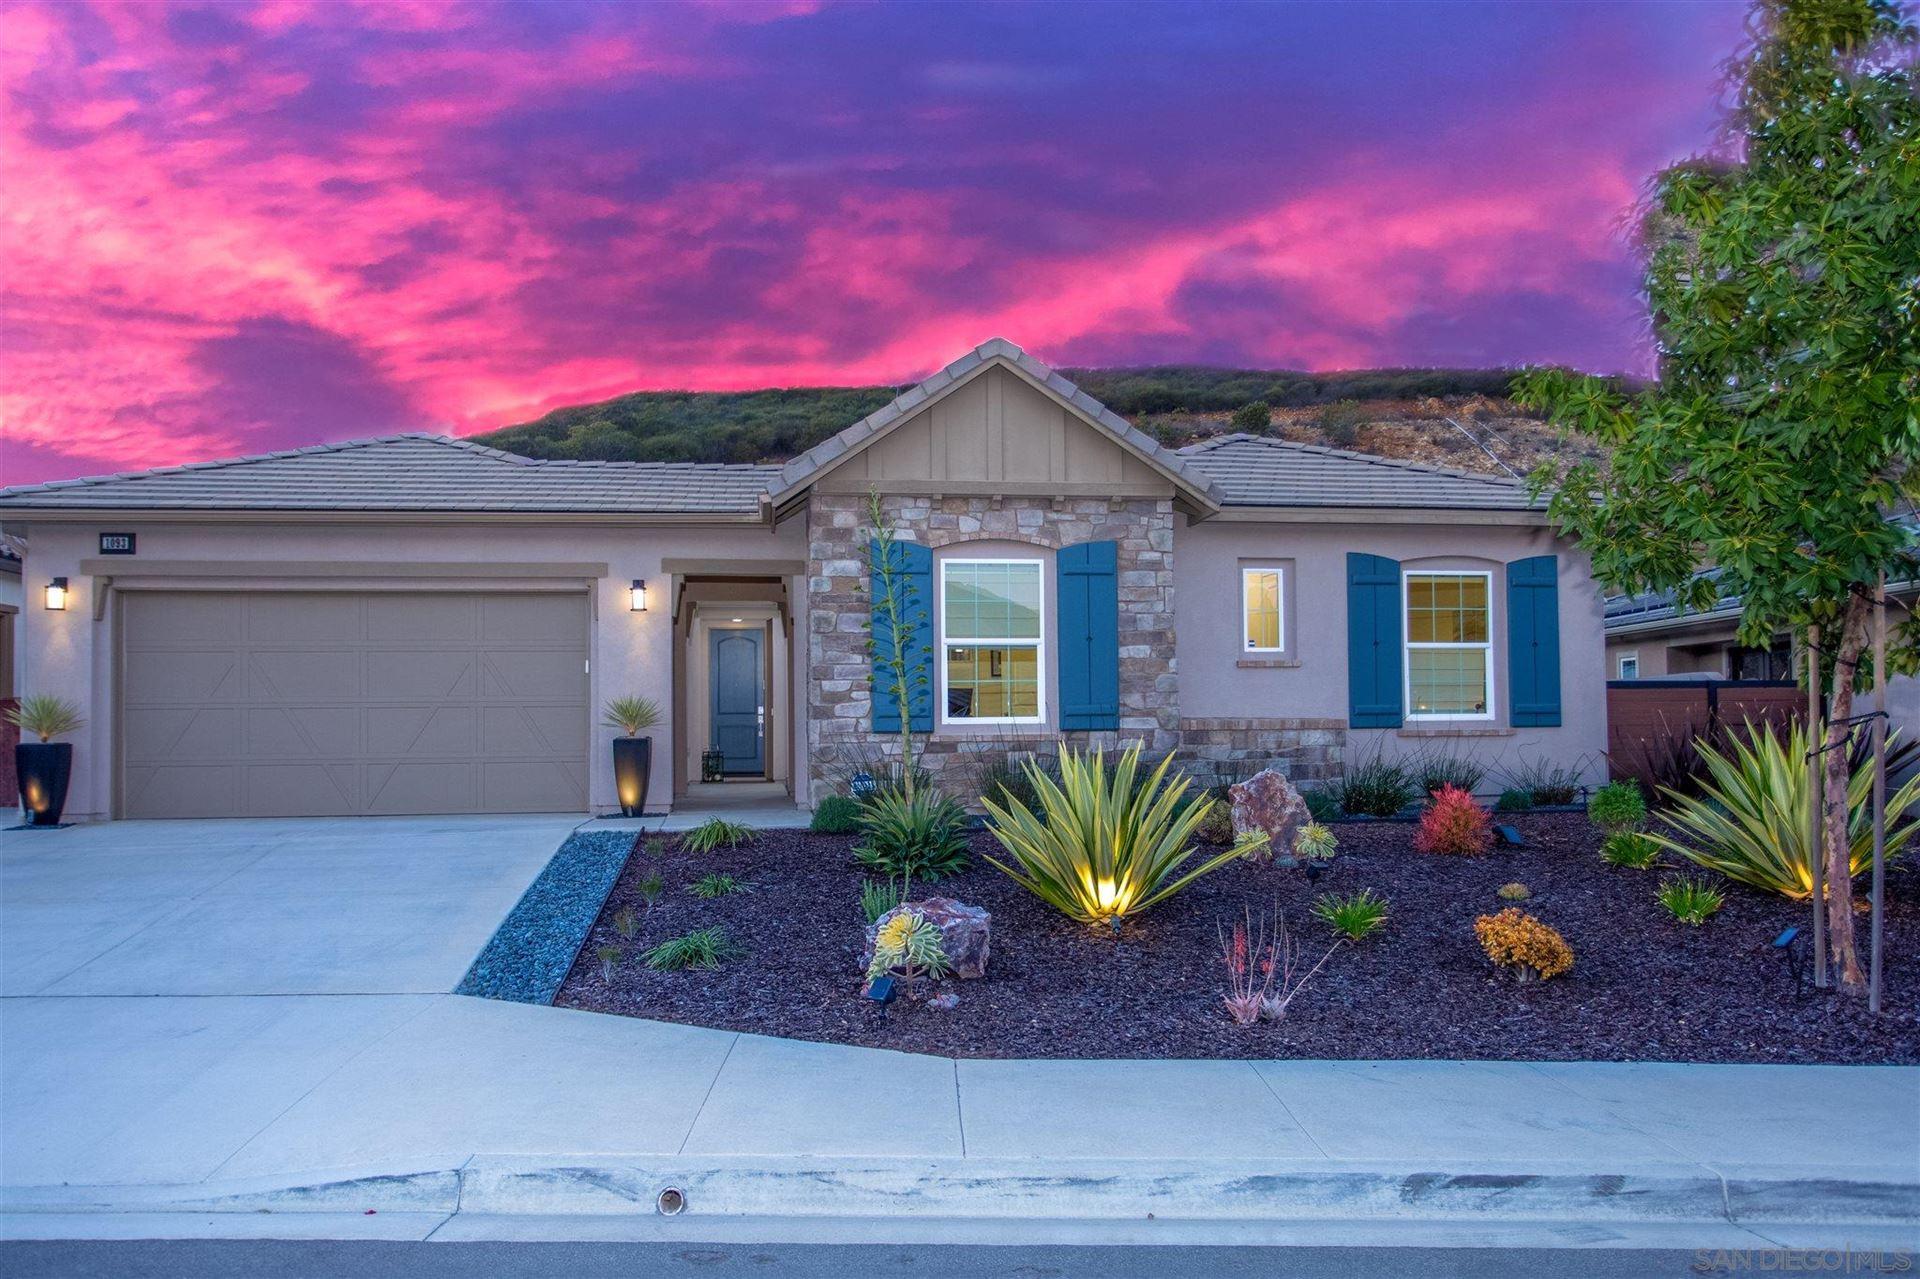 Photo of 1093 Duncan Ct, San Marcos, CA 92078 (MLS # 210001038)